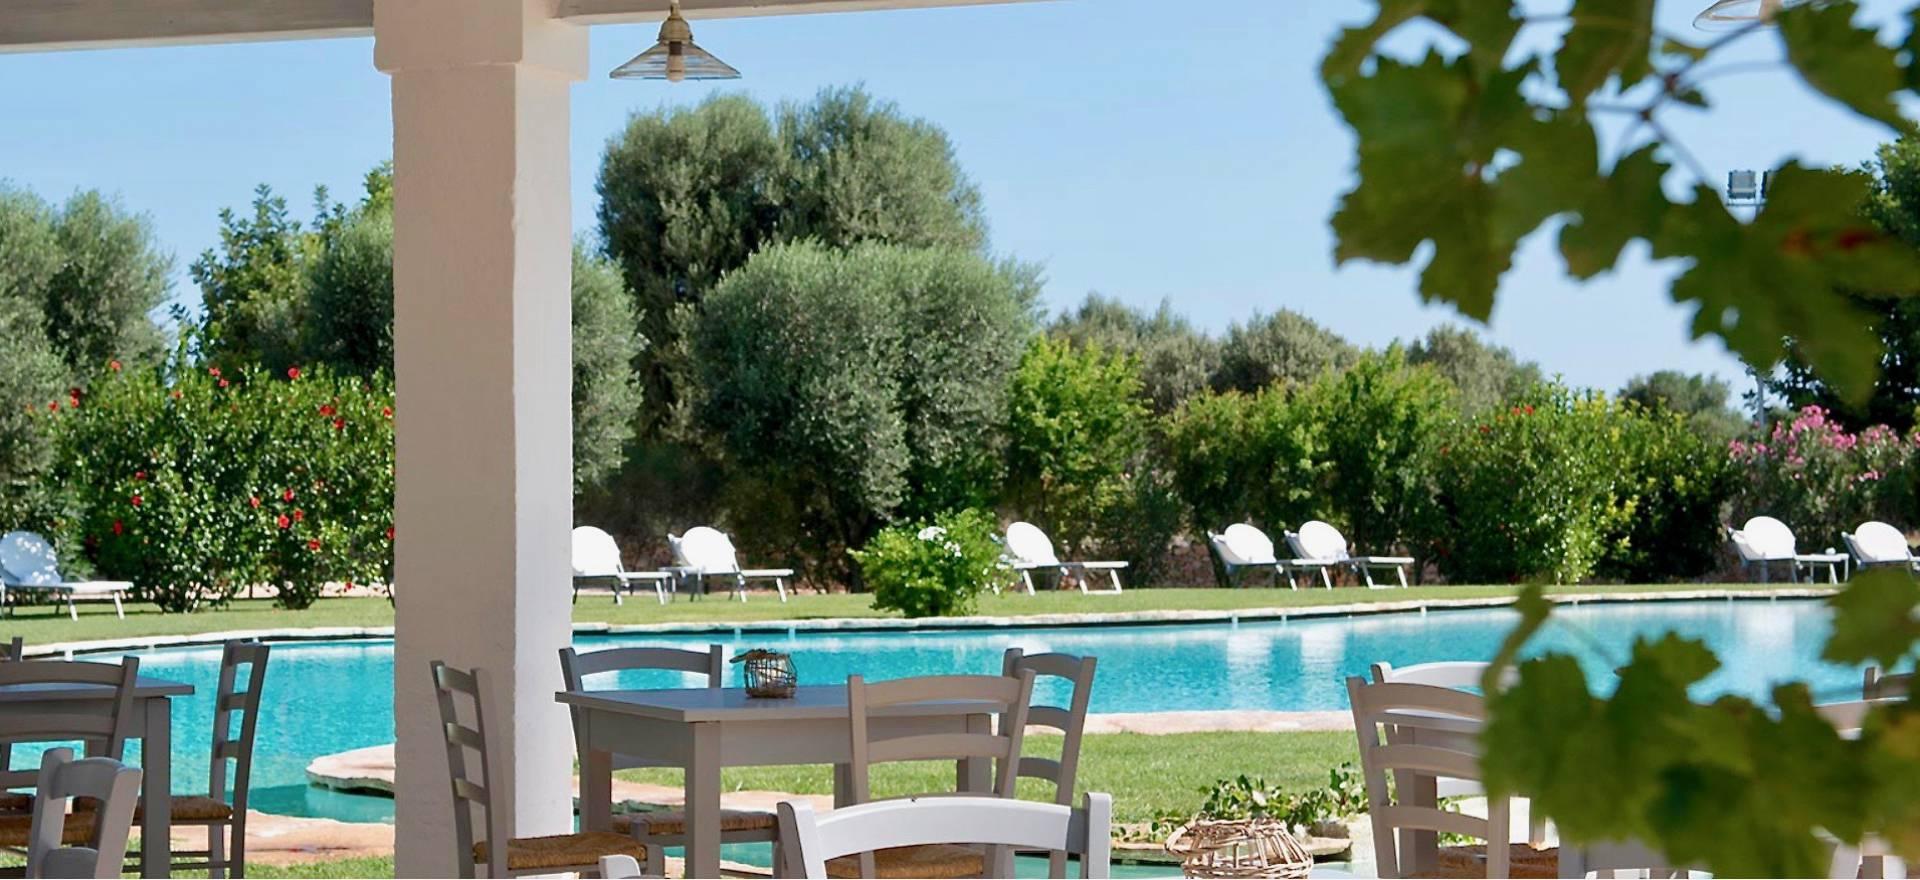 https://www.myitalyselection.it//images/fotos/agri_header/agriturismo-di-lusso-con-piscina-e-vicino-al-mare-imrw-screenshot-59-6.jpg